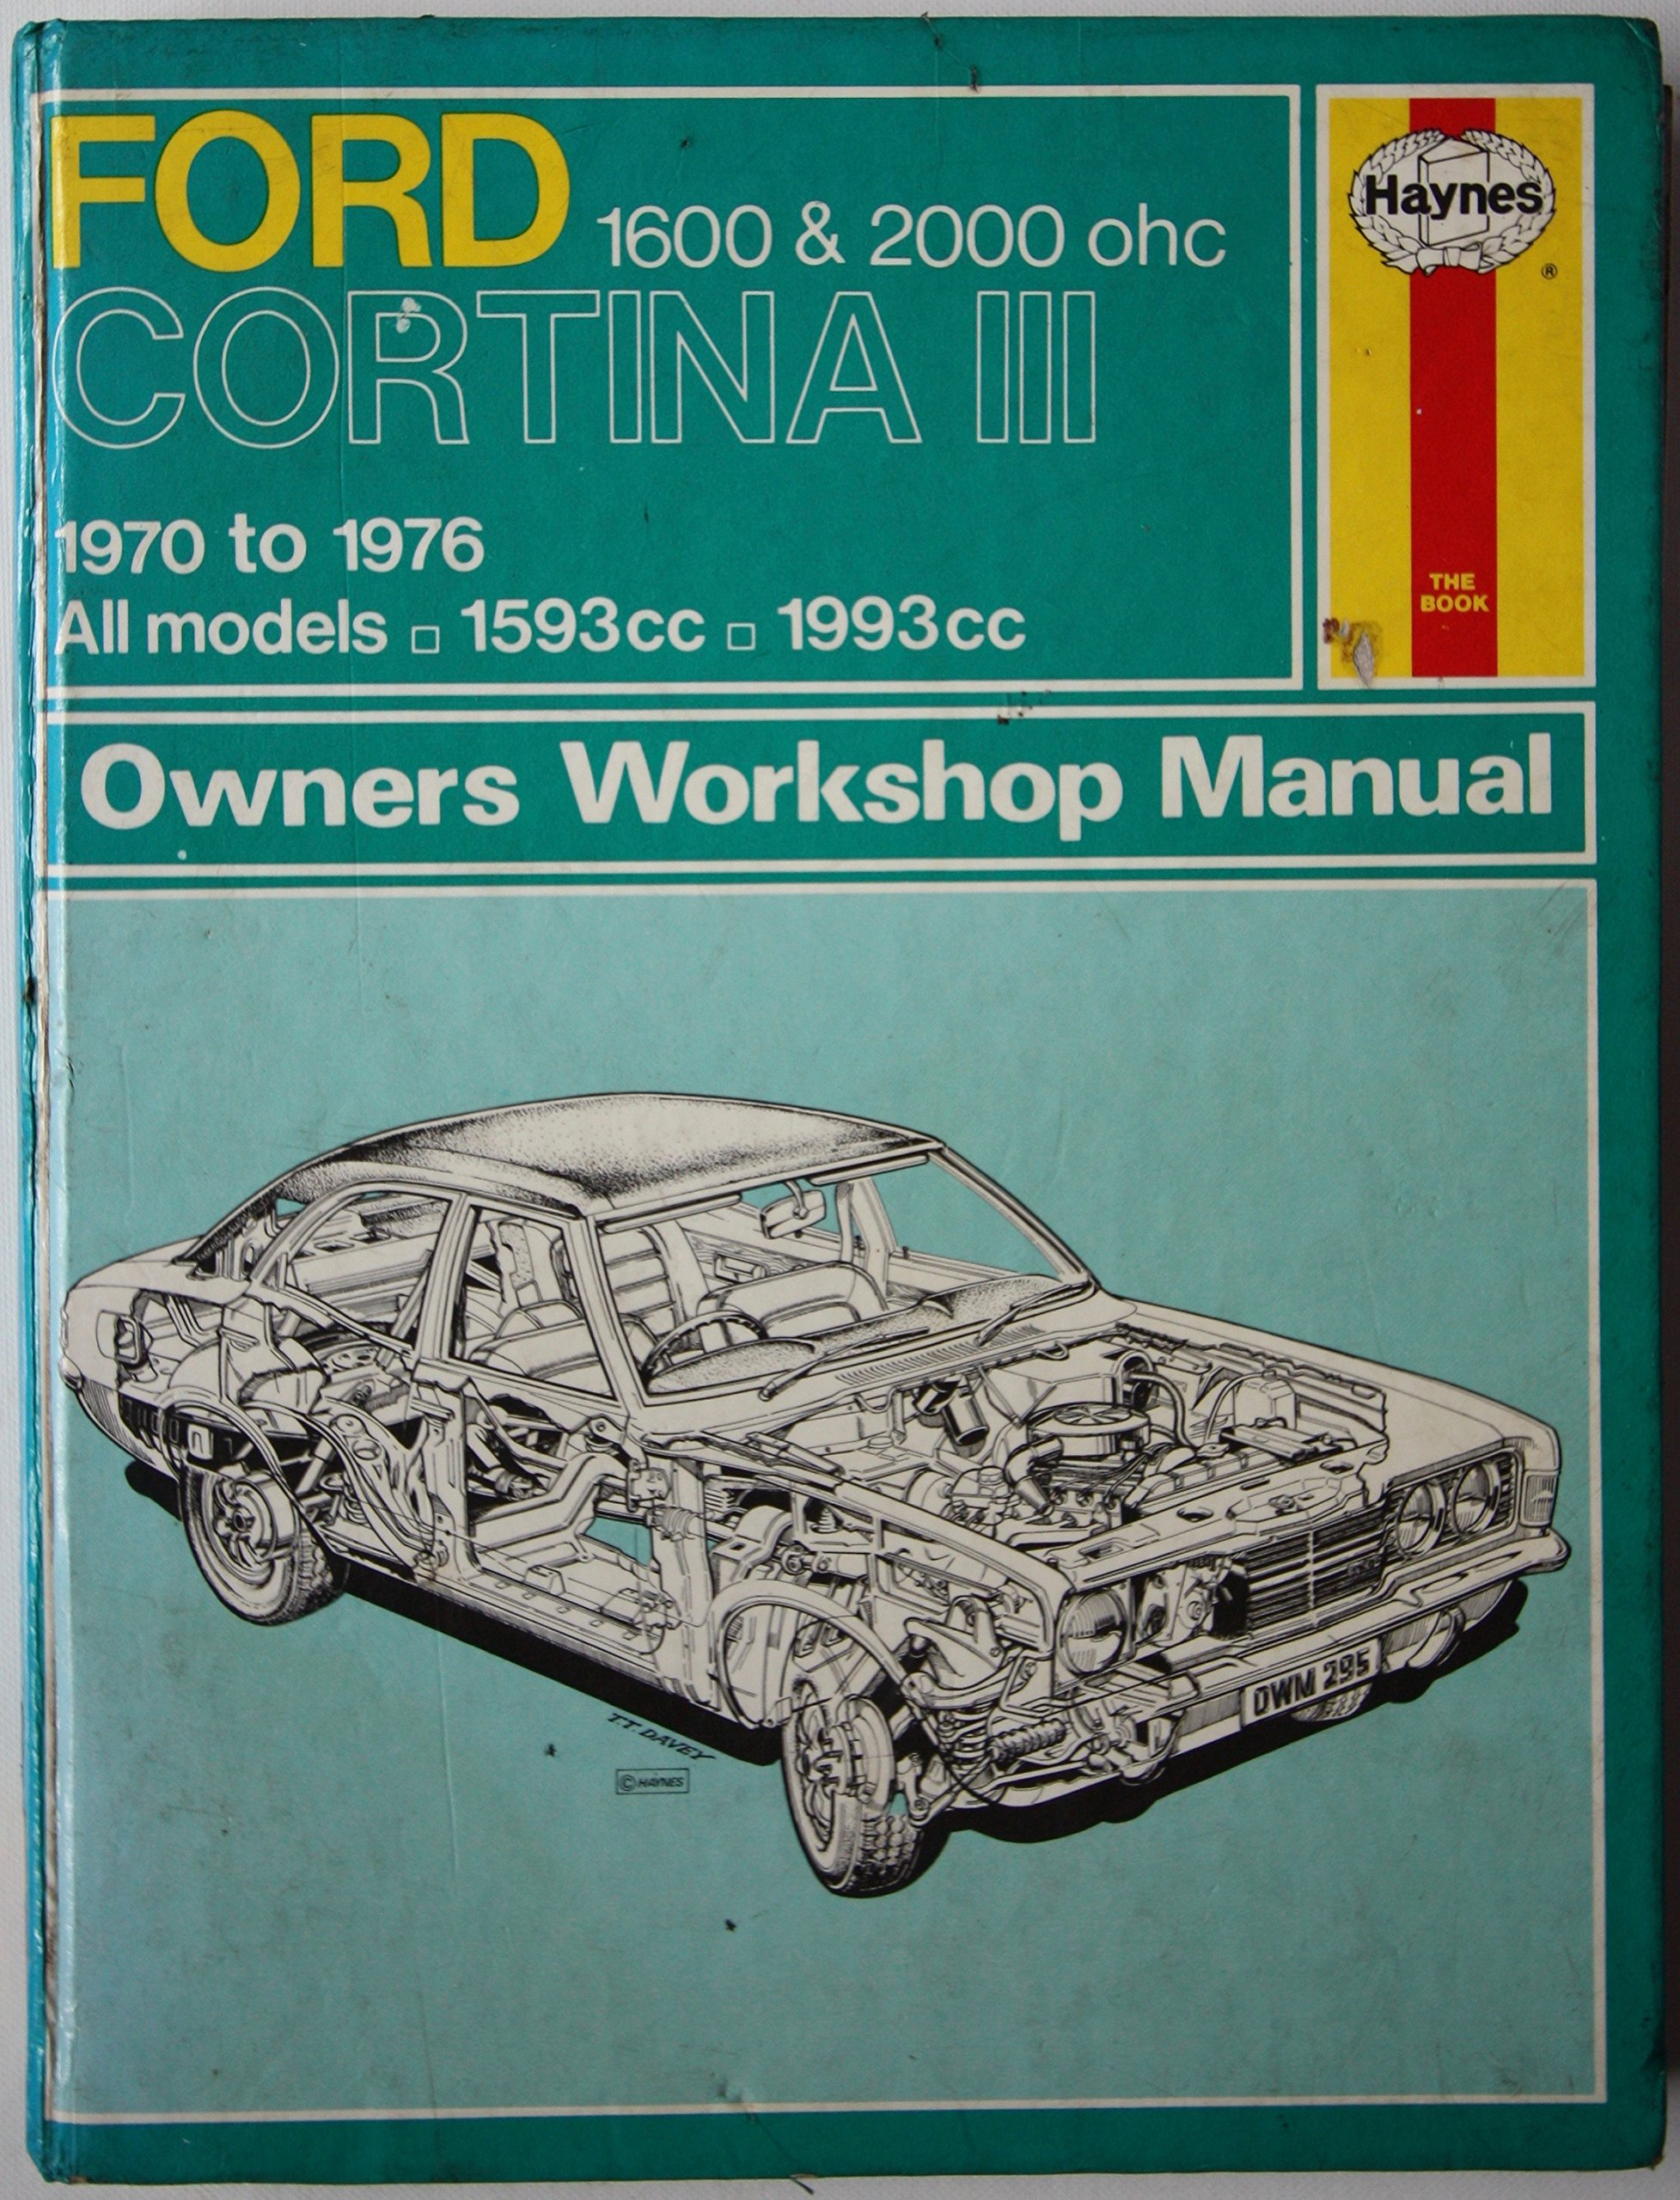 Ford Cortina Mk.III 1600 and 2000 O.H.C.Owner's Workshop Manual (Service & repair  manuals): Amazon.co.uk: J. H. Haynes, B.L.Chalmers- Hunt, ...